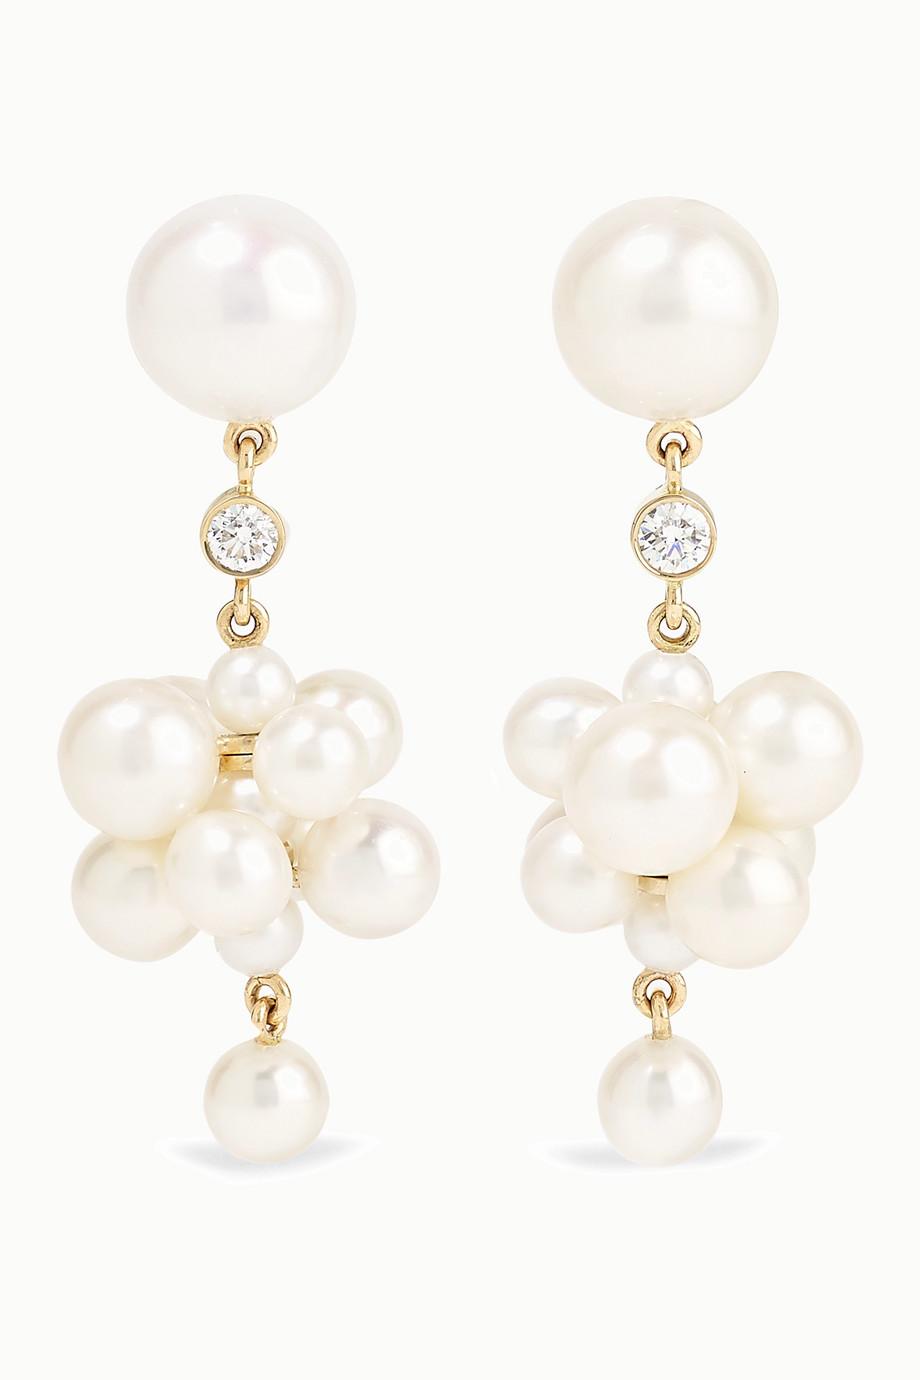 Sophie Bille Brahe Botticelli 14-karat gold, pearl and diamond earrings